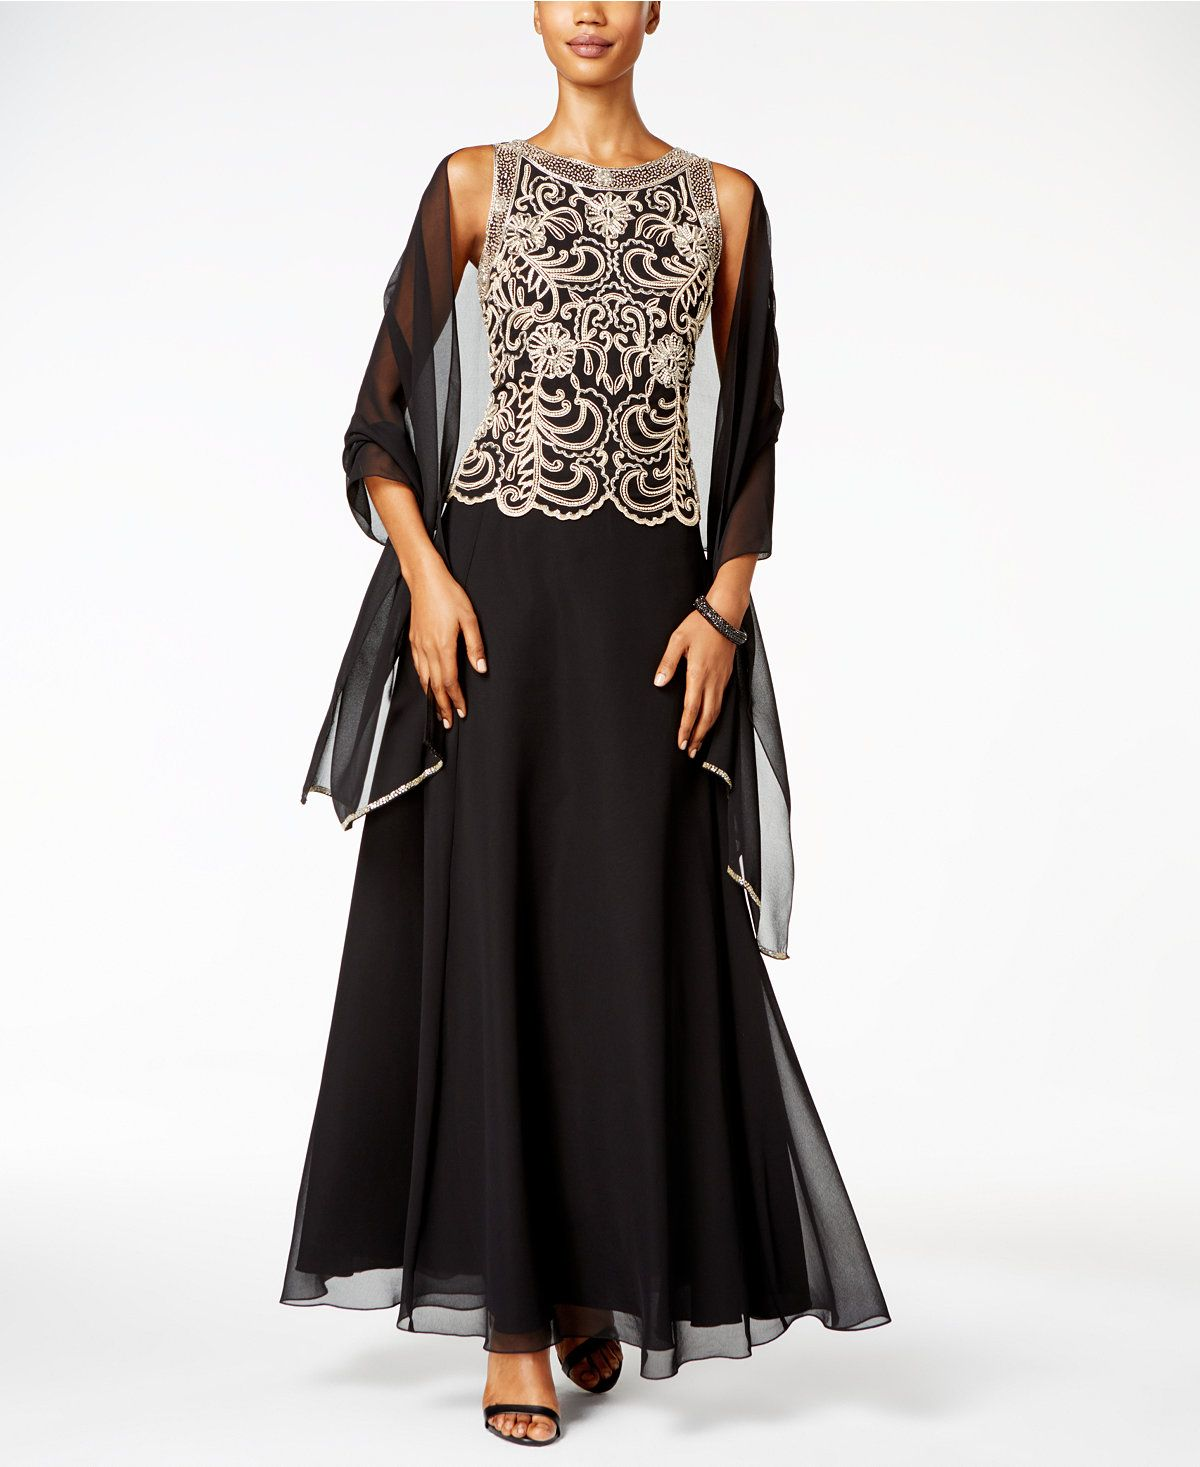 2574c2da912 J Kara Beaded A-Line Gown and Scarf - Dresses - Women - Macy s